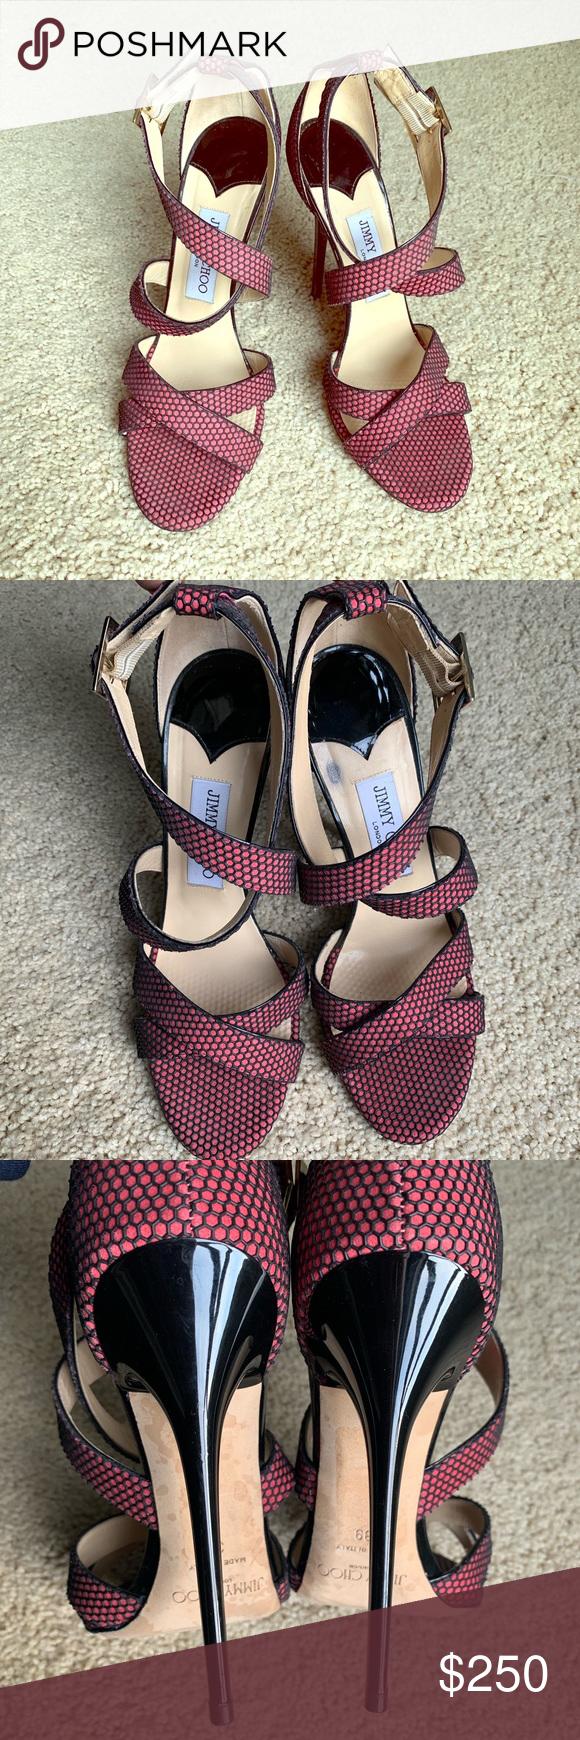 9851e72158e4 Jimmy Choo Lottie Sandals Size 39 Jimmy Choo Lottie Sandals. Size 39. Worn  two times. In excellent condition. Jimmy Choo Shoes Sandals